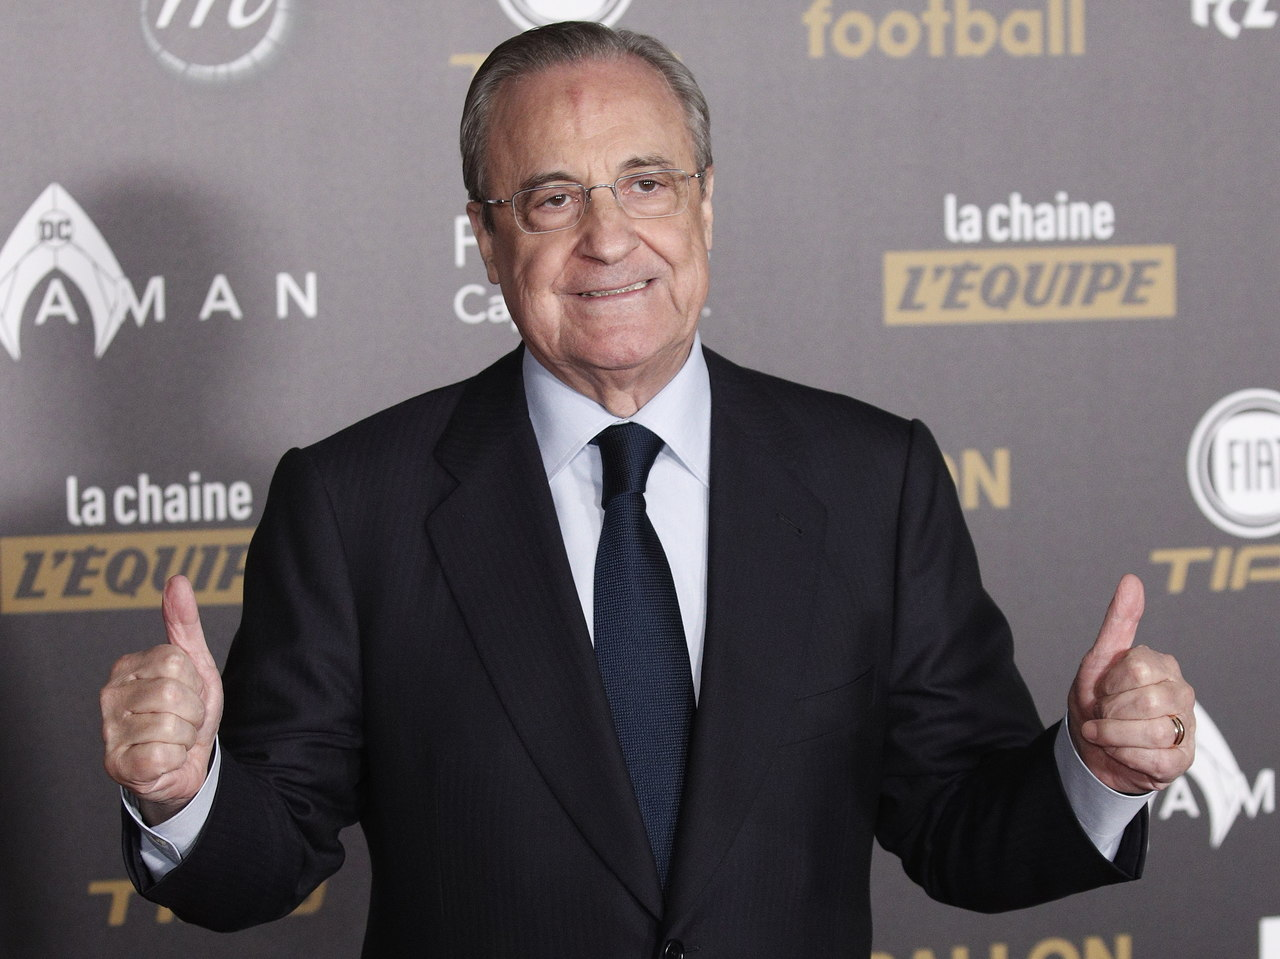 Cristiano no volverá, asegura Florentino